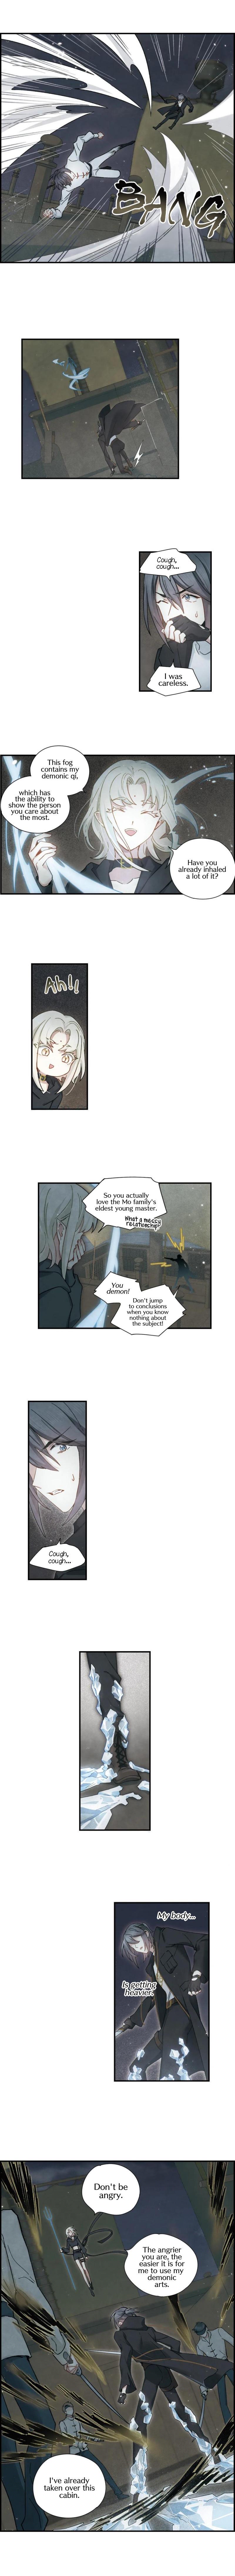 Mejaz - Regulus In The World Chapter 34.1: Demonic Influence page 3 - Mangakakalots.com